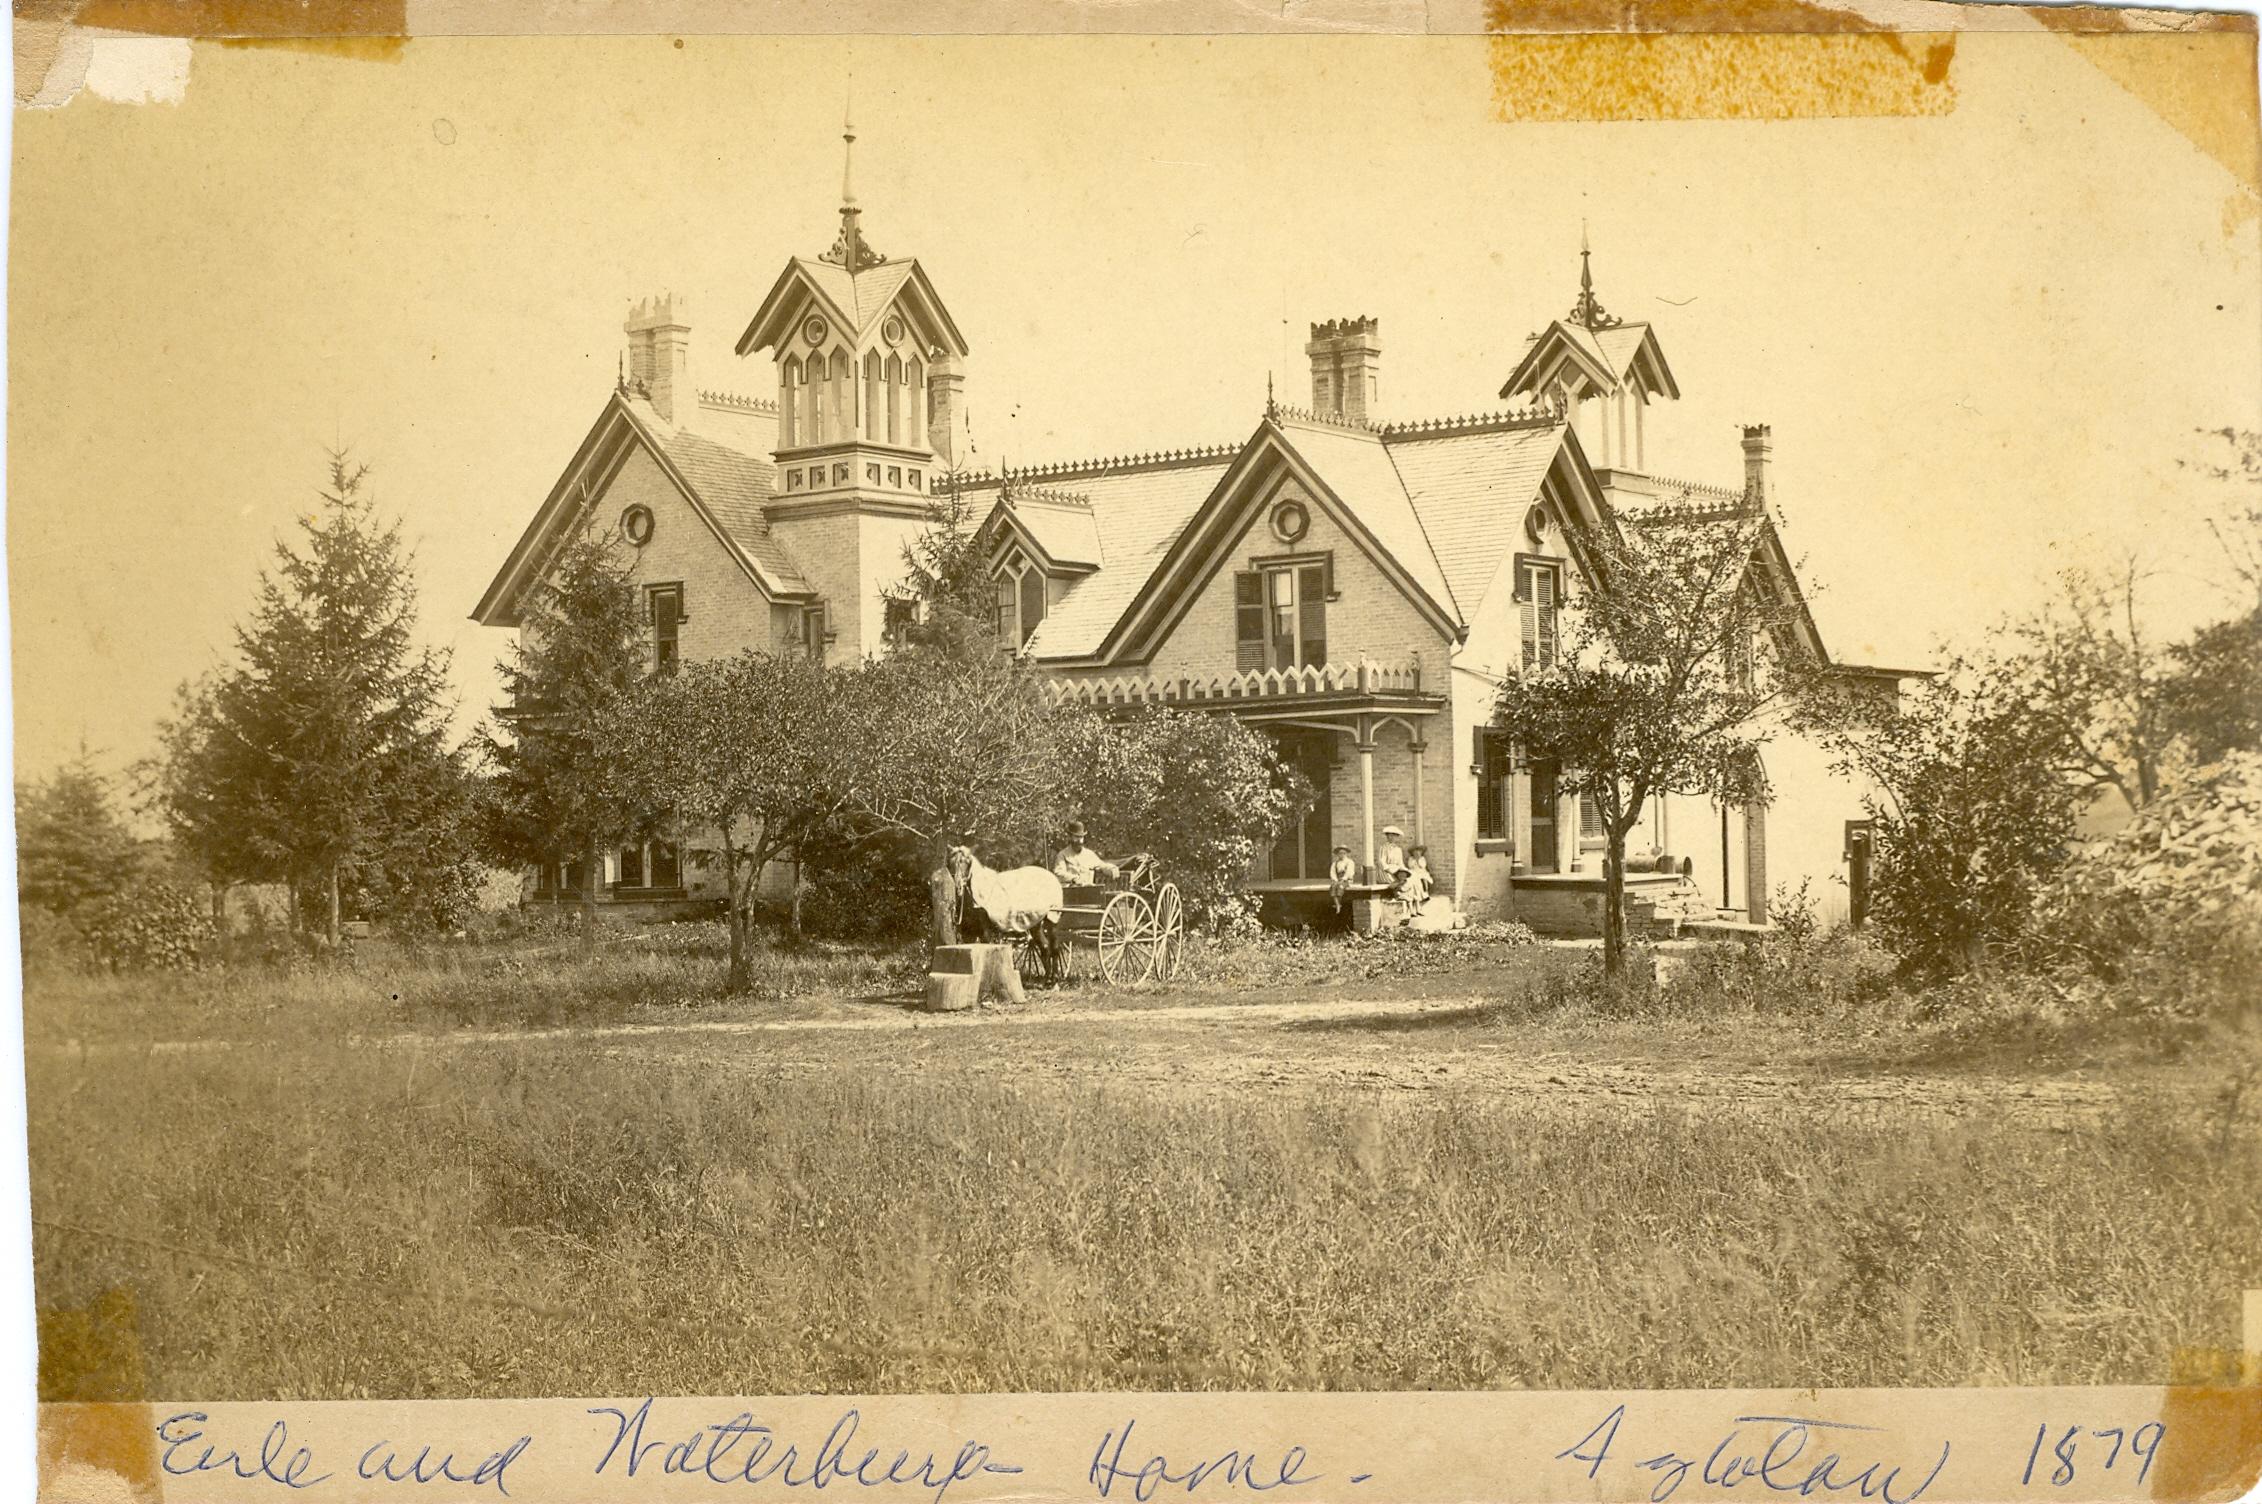 Earle and Waterbury Home Aztalan 1879